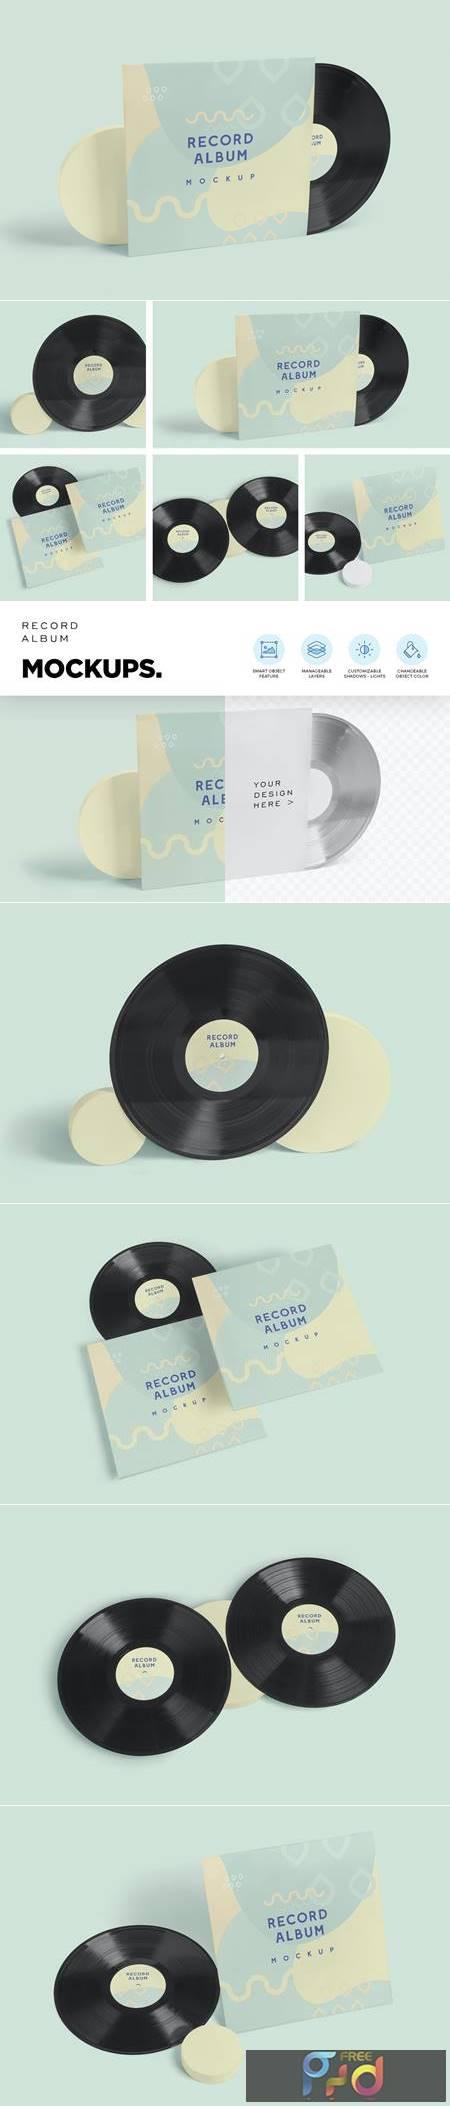 Vinyl Record Album Mockups Y7WQ692 1